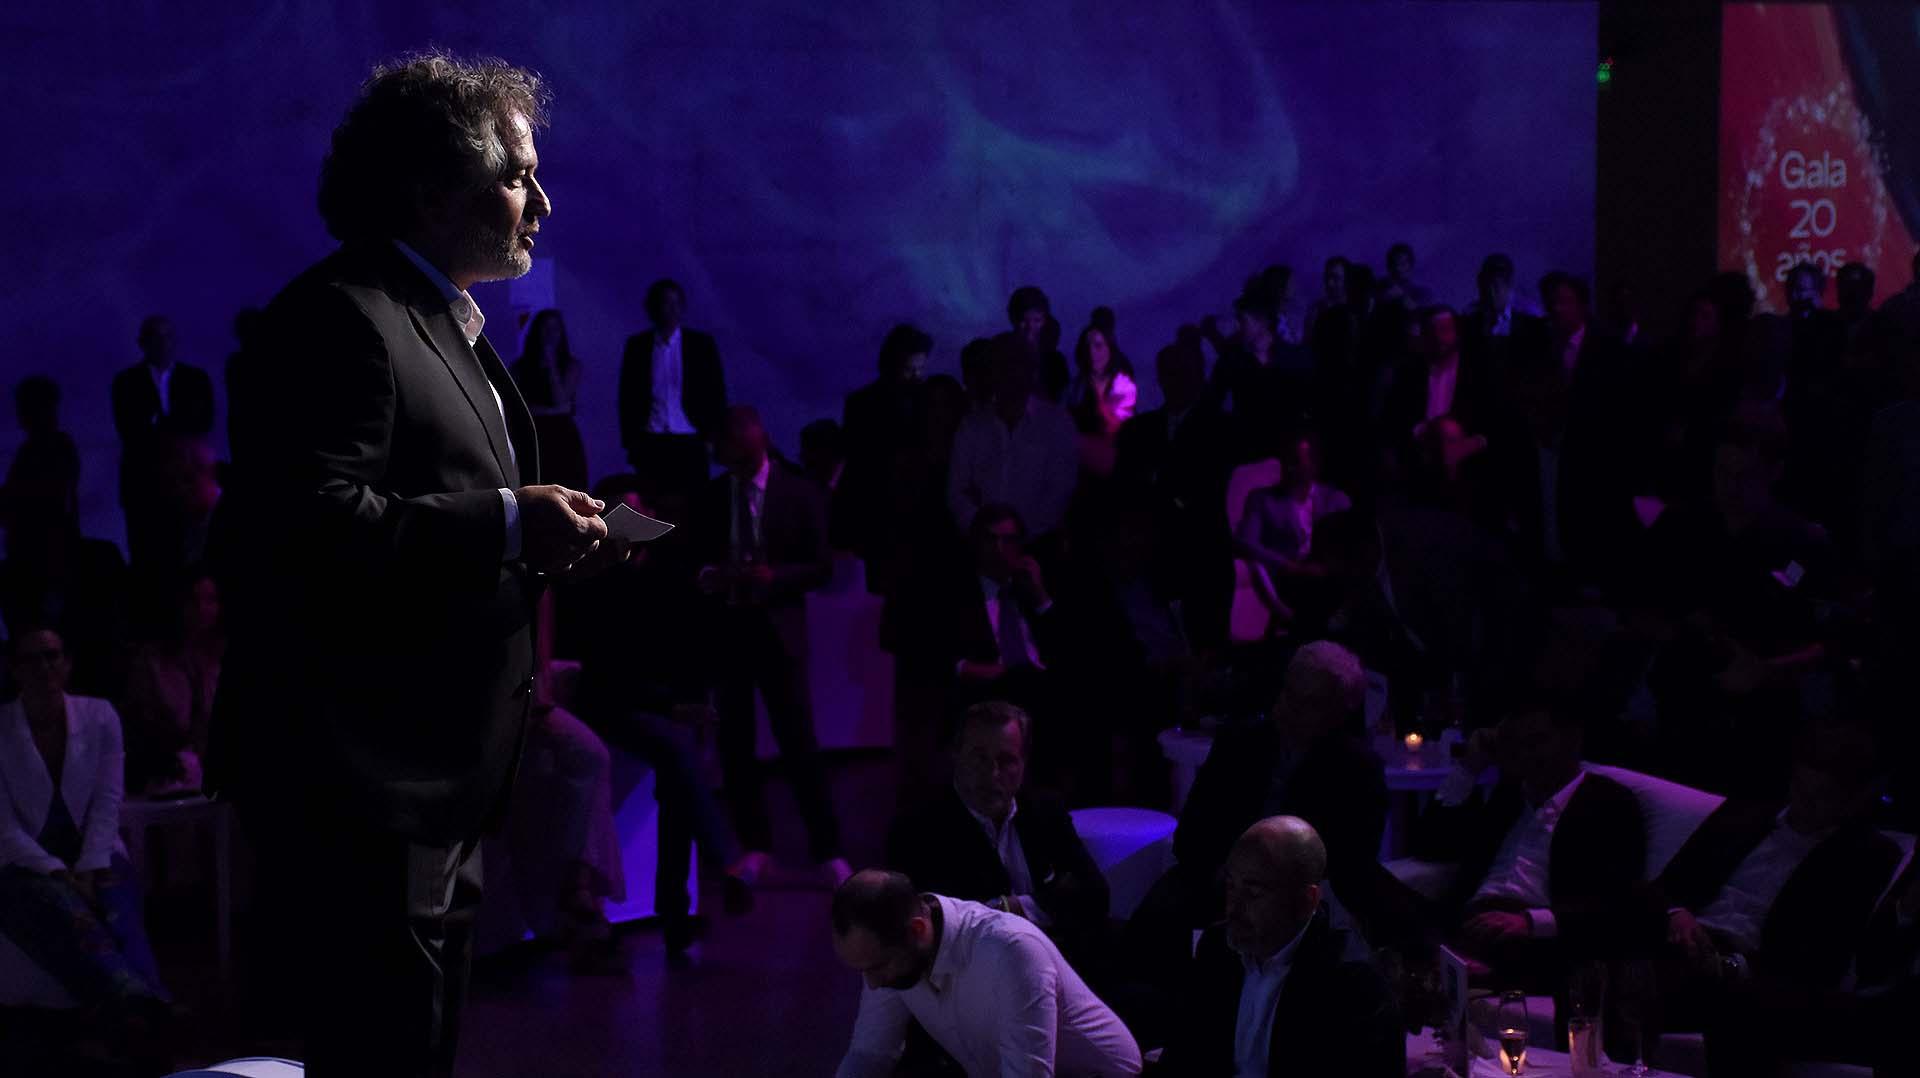 Guibert Englebienne, presidente de Endeavor Argentina y CFO de Globant habla al auditorio